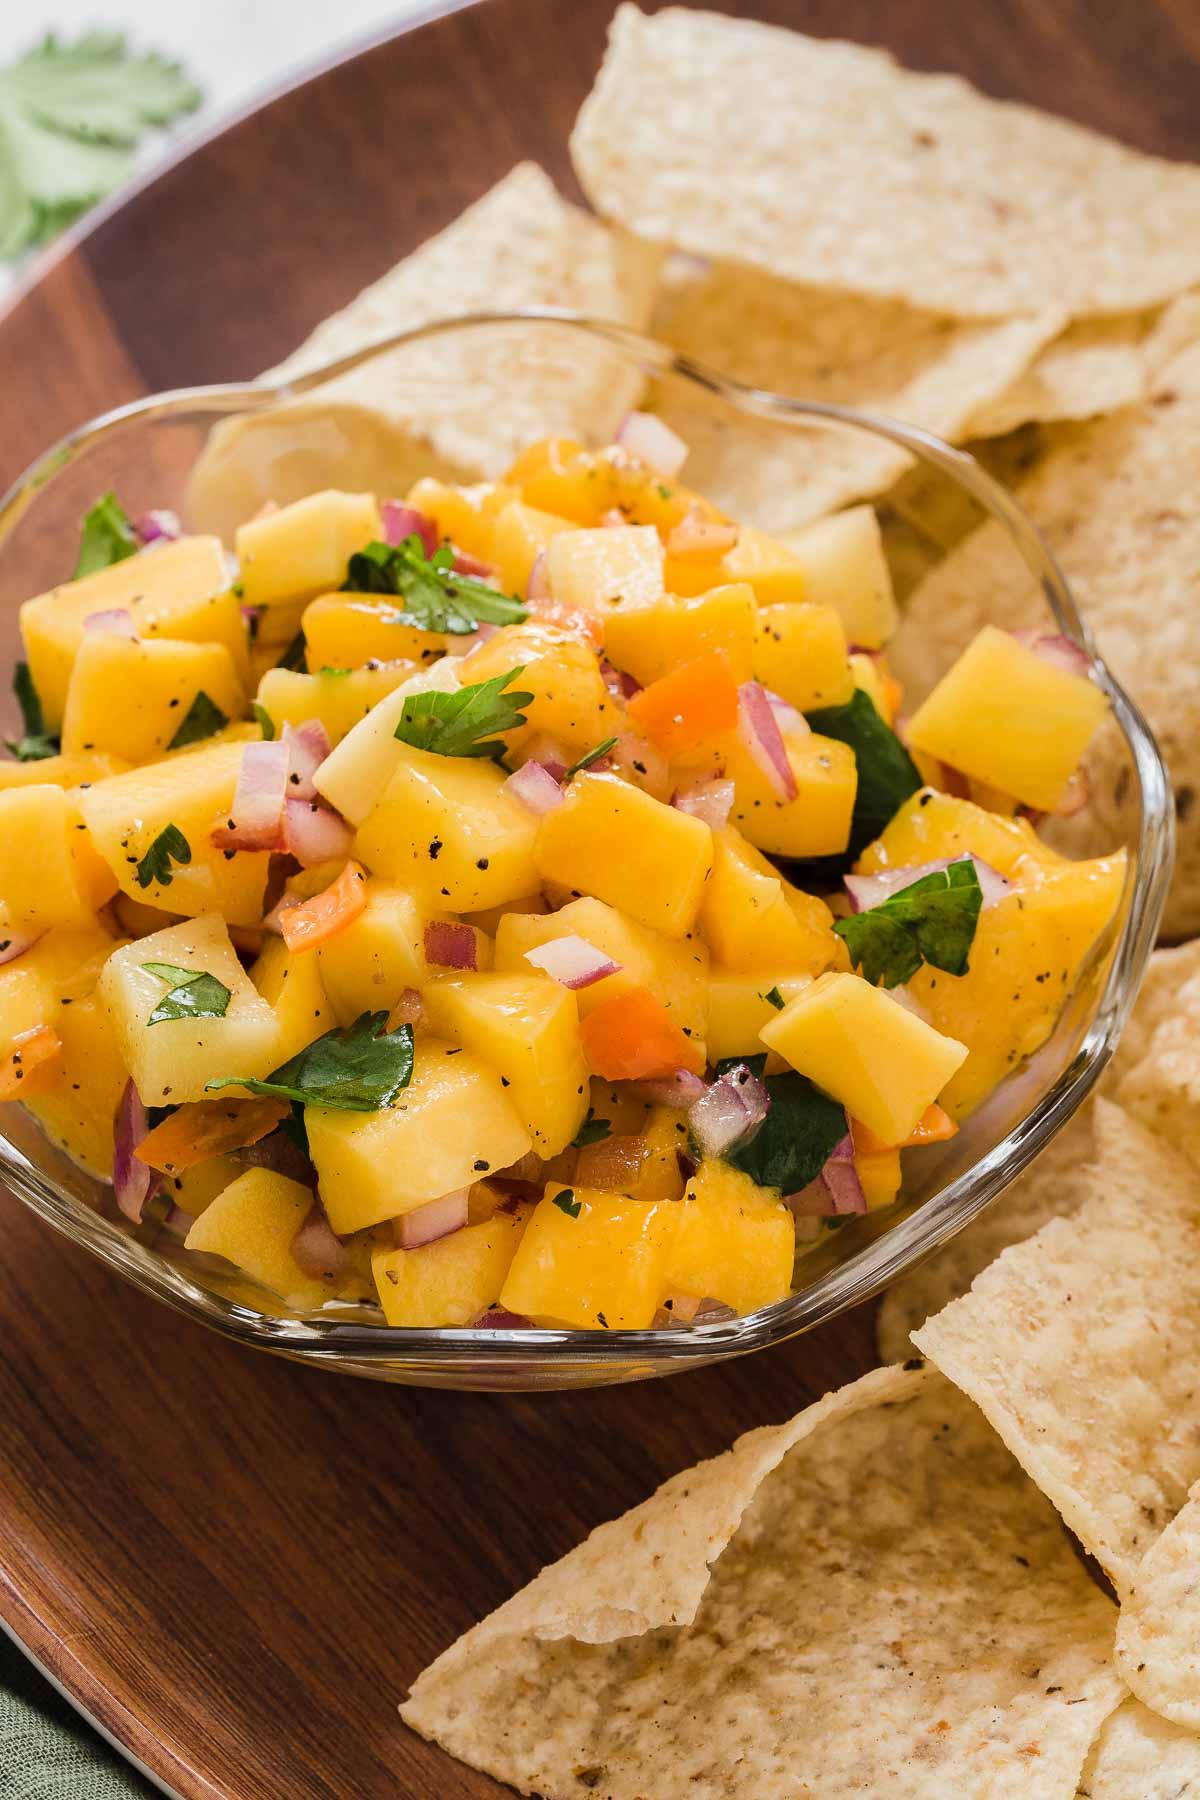 Bright orange mango habanero salsa in bowl with chips on side.